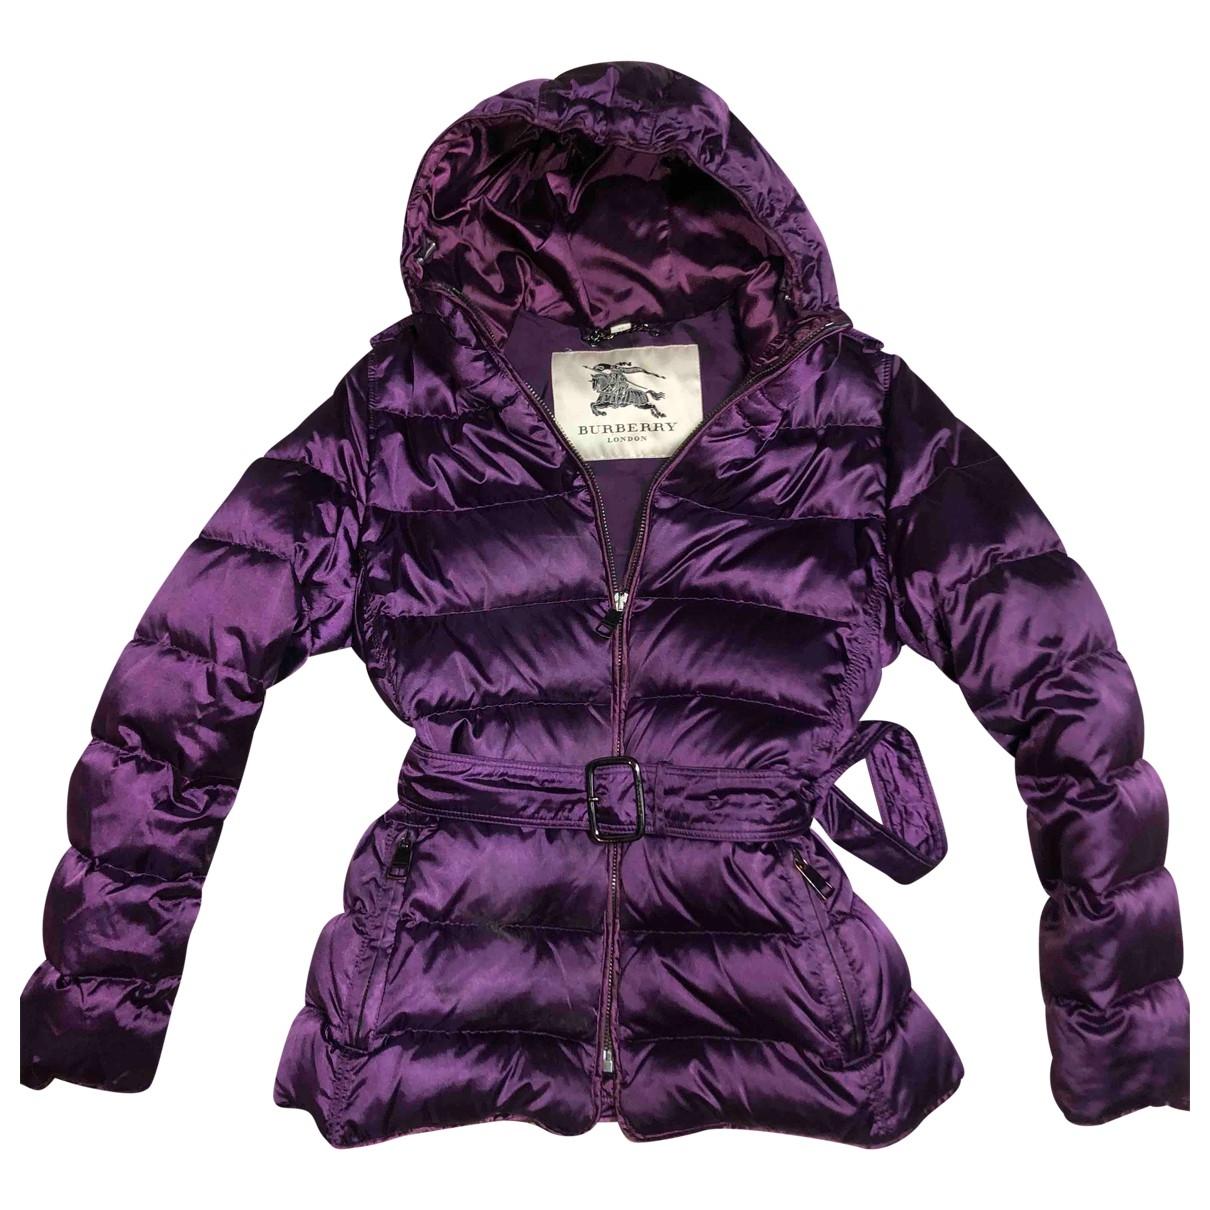 Burberry \N Purple coat for Women M International